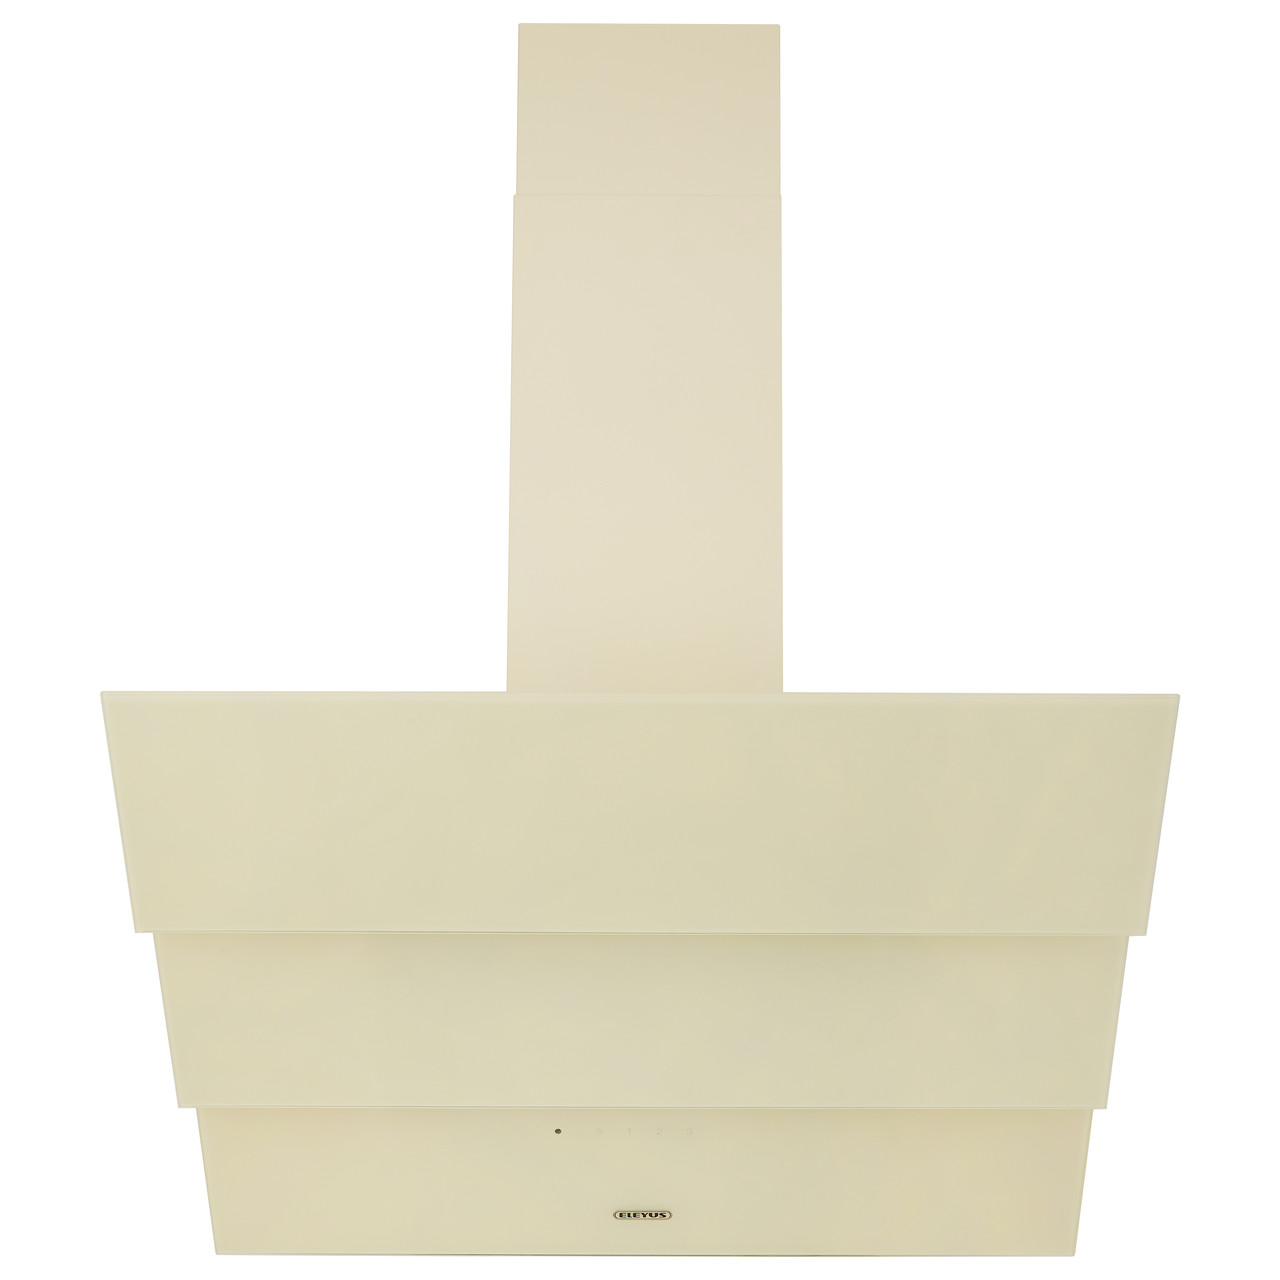 Витяжка кухонна вертикальна ELEYUS Fiona 700 60 BG + Безкоштовна доставка!